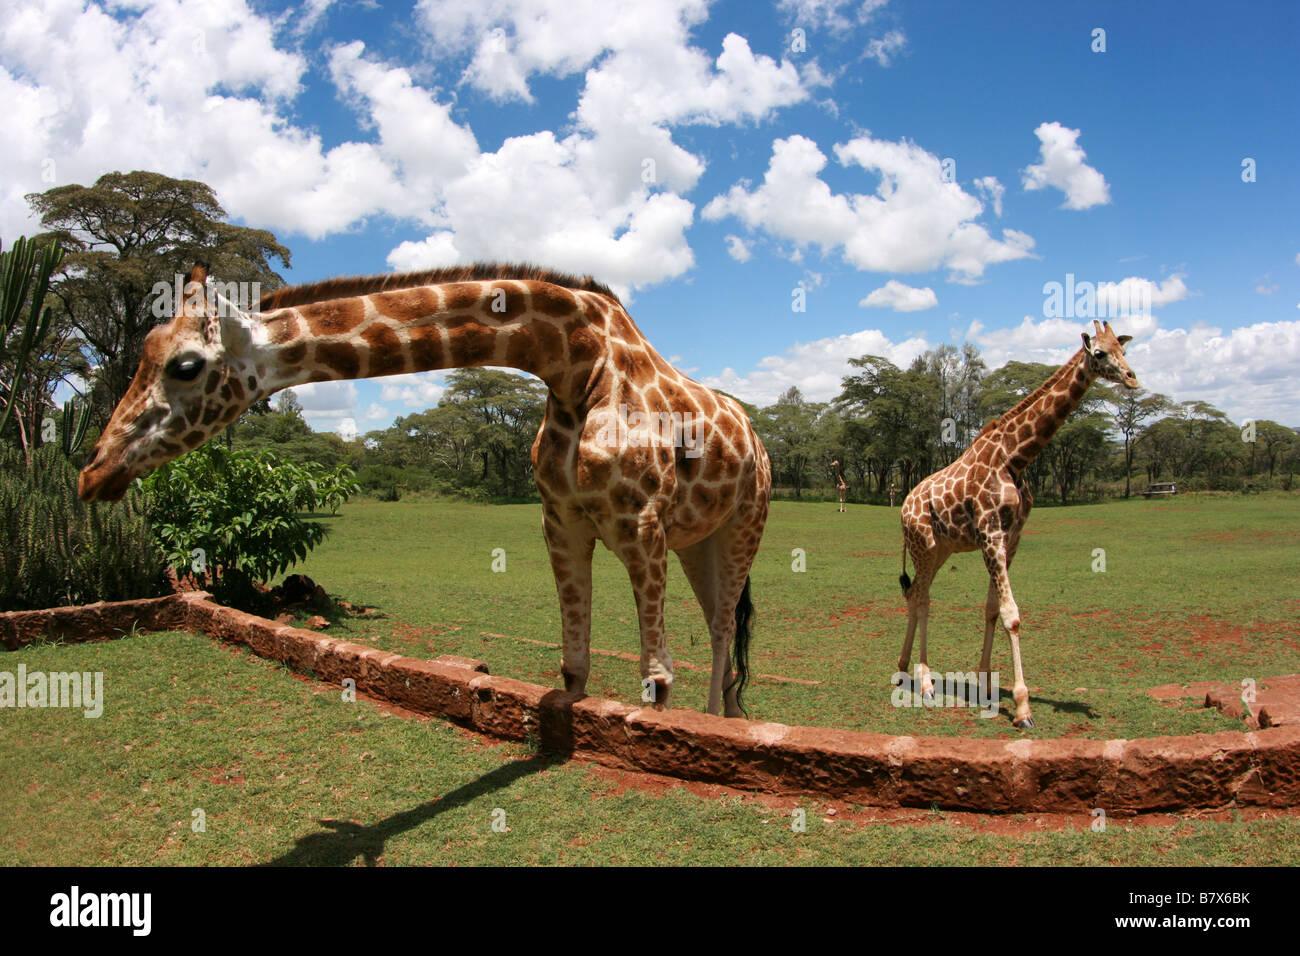 Rothschild Giraffe,Giraffa camelopardalis rothschildi,Giraffidae, Coat, Hair,Ungulate, Mammal, Horns, Long Neck, - Stock Image